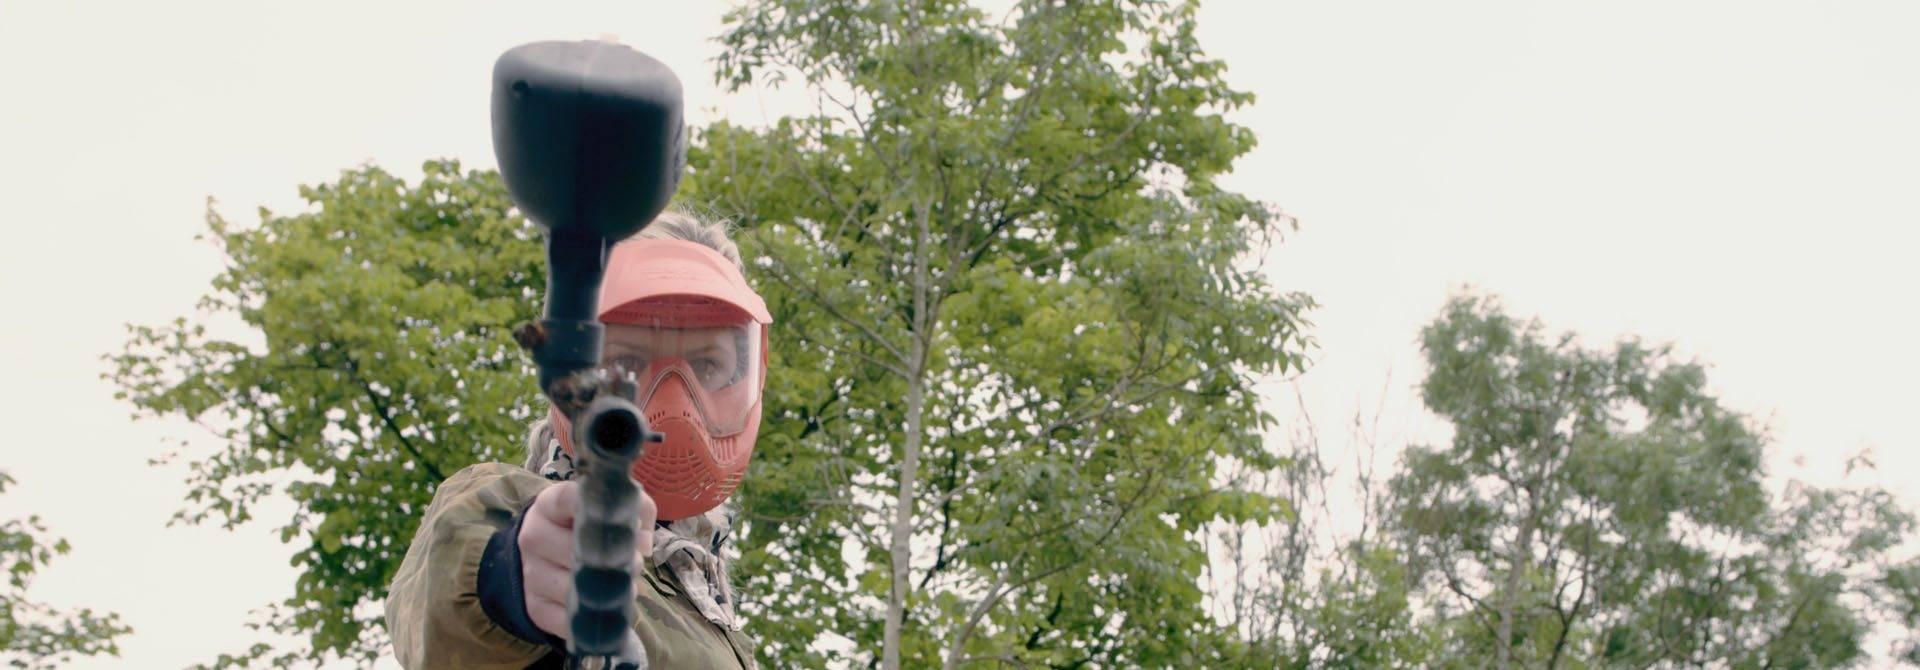 Paintball Massacre Strikes DVD And Digital This December